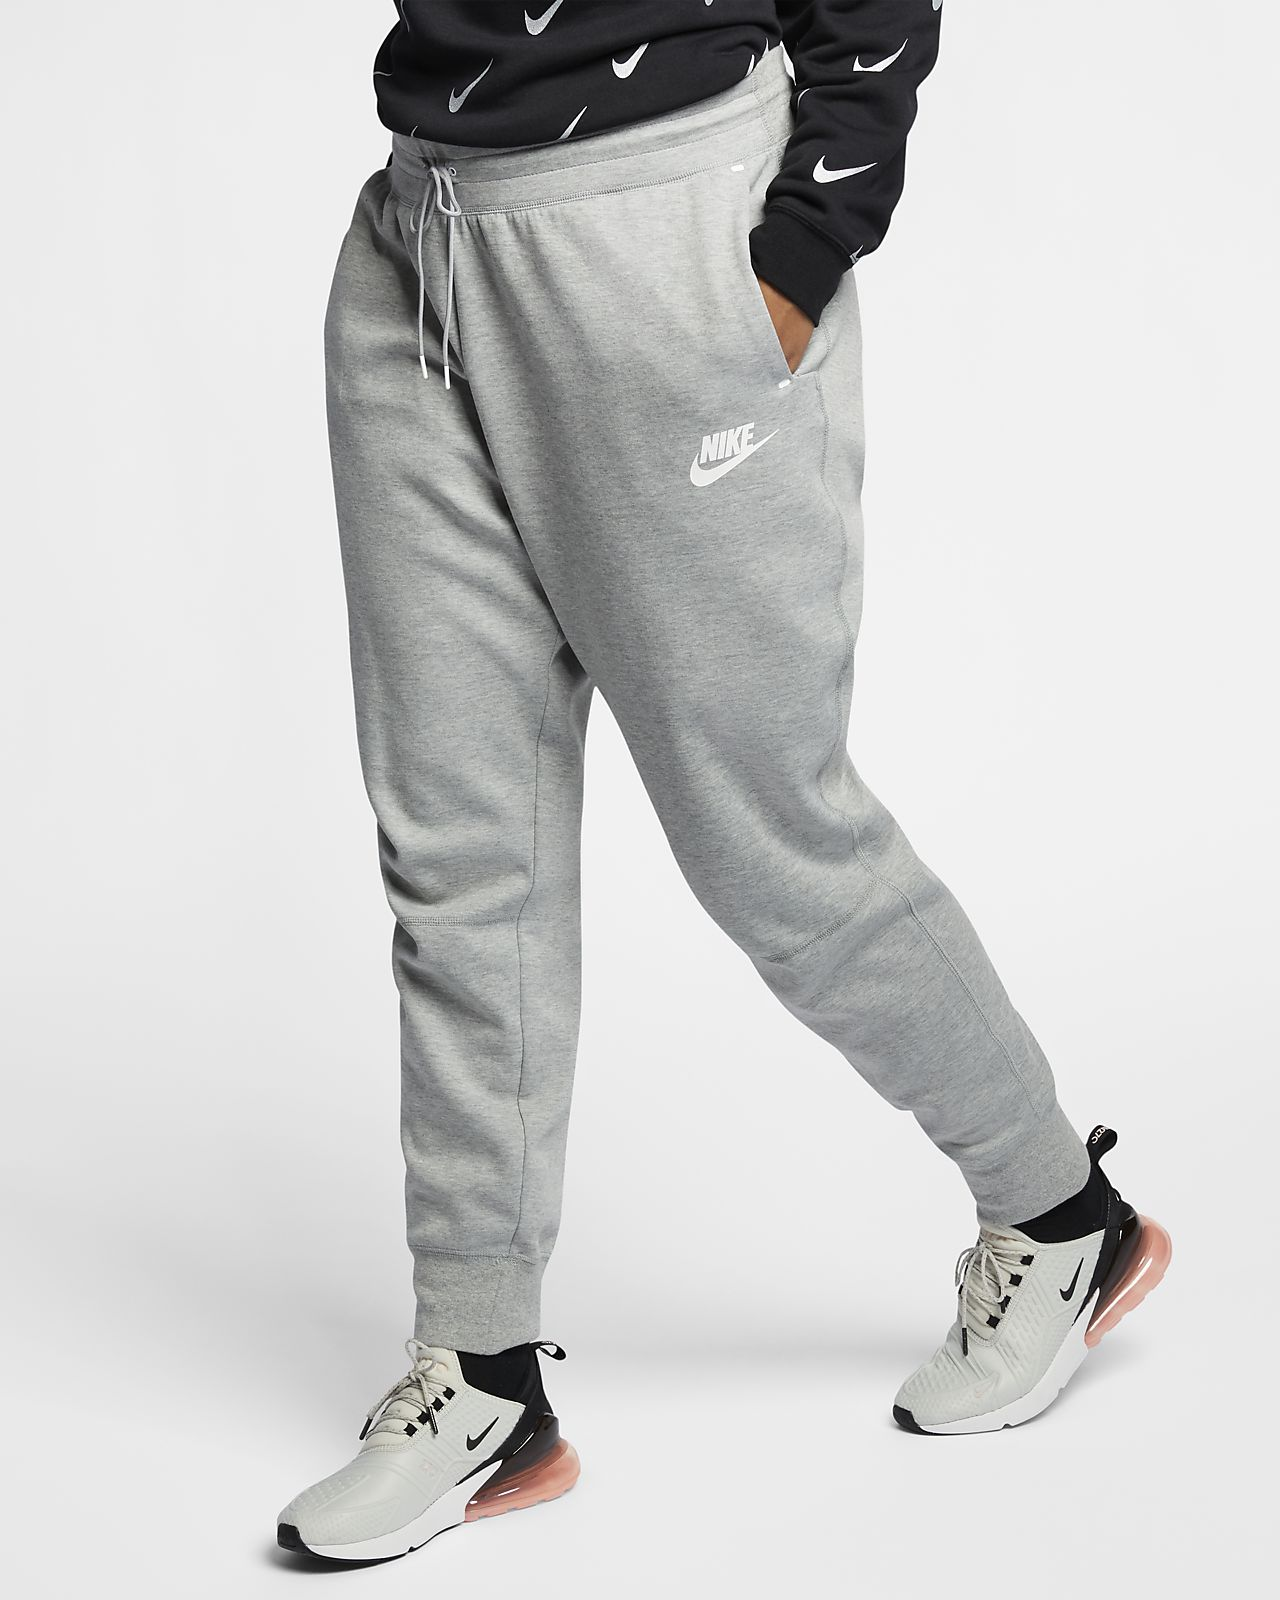 a83d39a762 Nike Sportswear Tech Fleece női nadrág (plus size méret). Nike.com HU